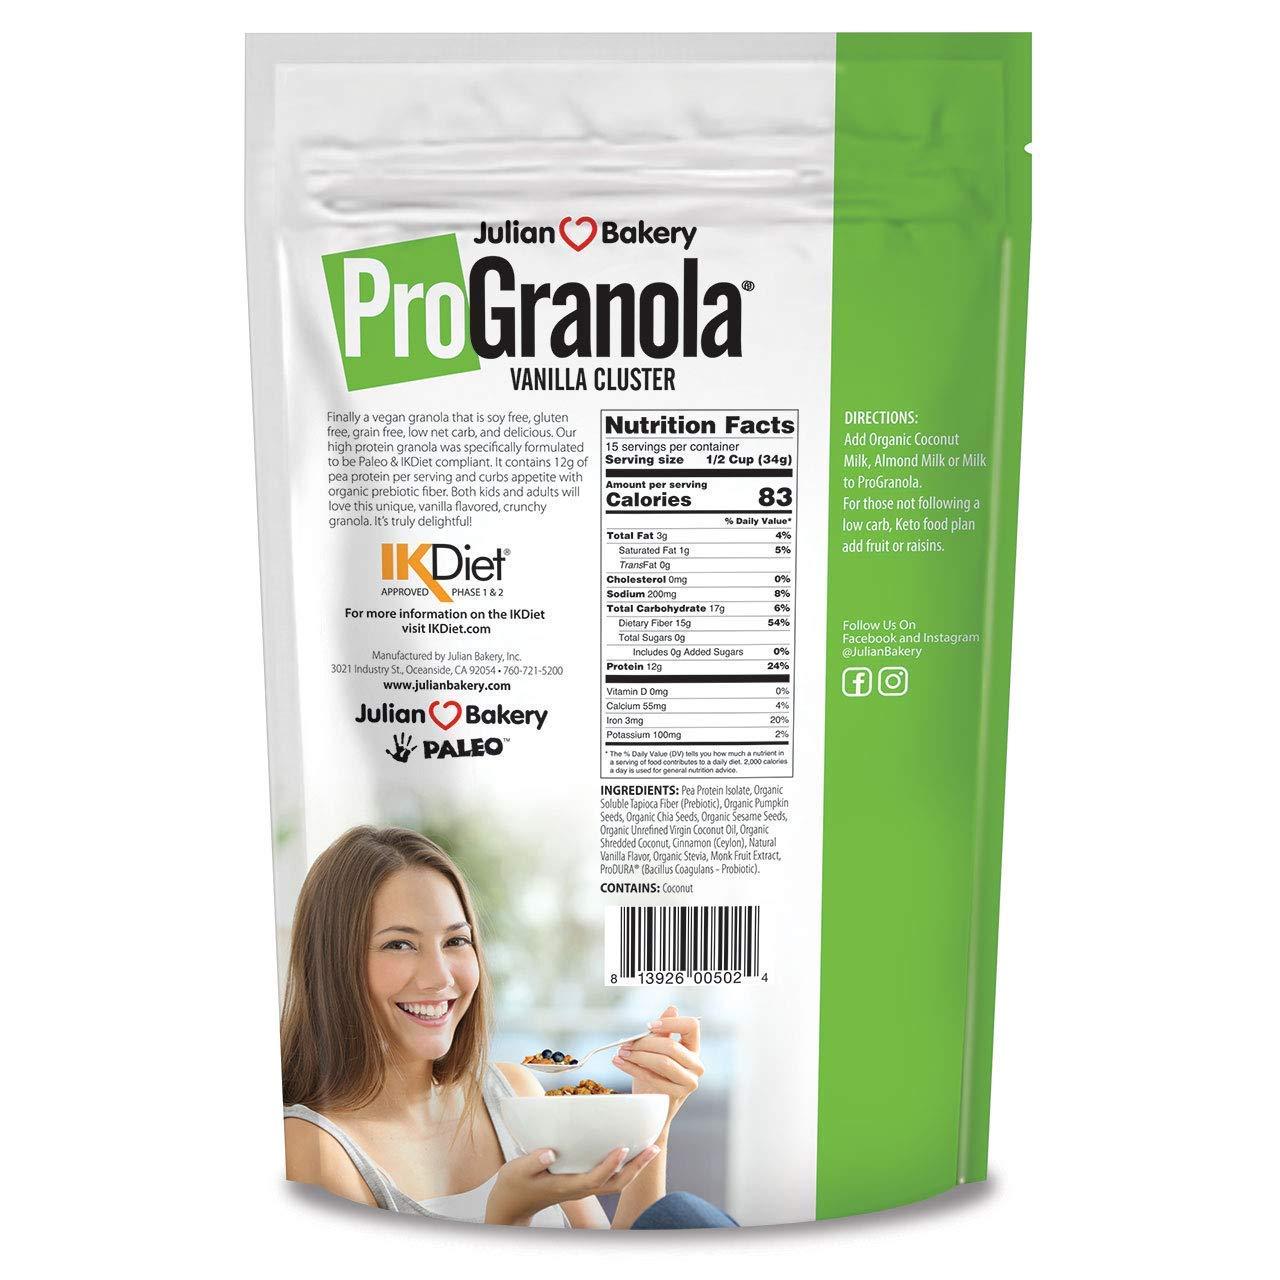 ProGranola VeganⓋ (Vanilla Cluster) (12g Protein) (Gluten-Free & Grain-Free) (2 Net Carbs) (15 Servings) by Julian Bakery (Image #2)